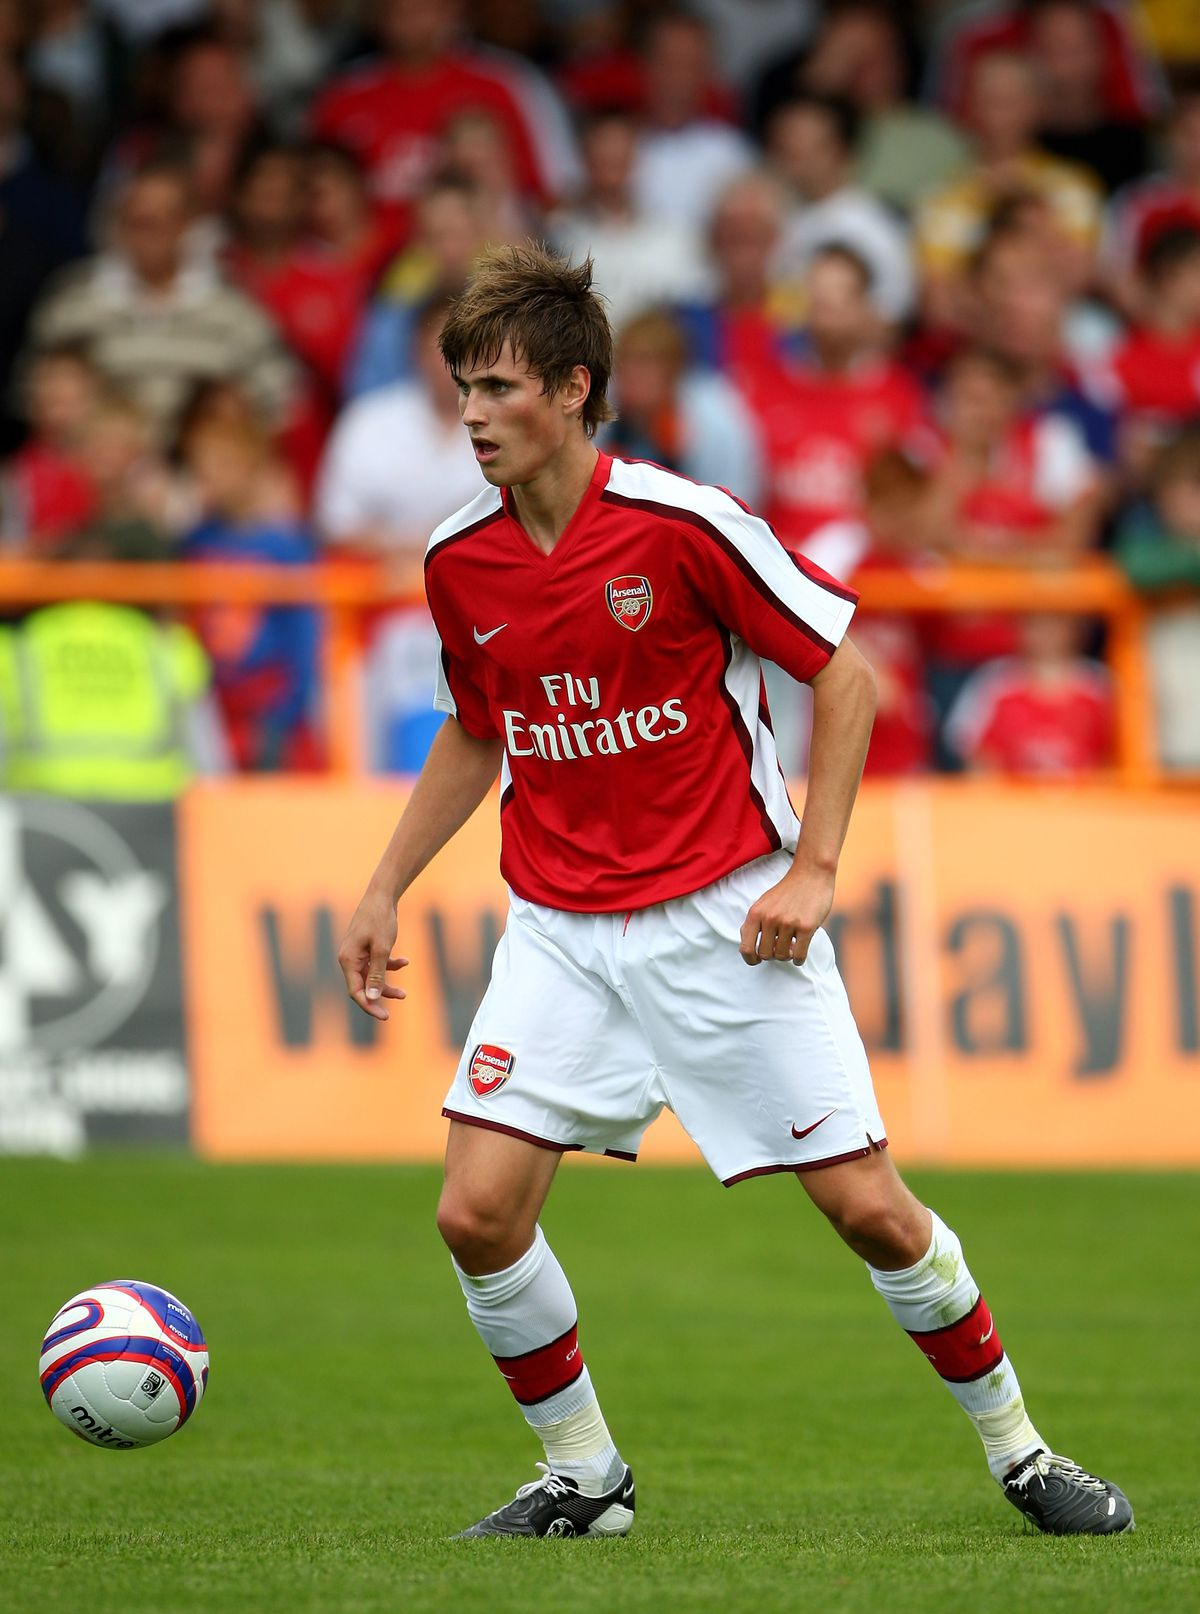 Barnet v Arsenal - Pre Season Friendly